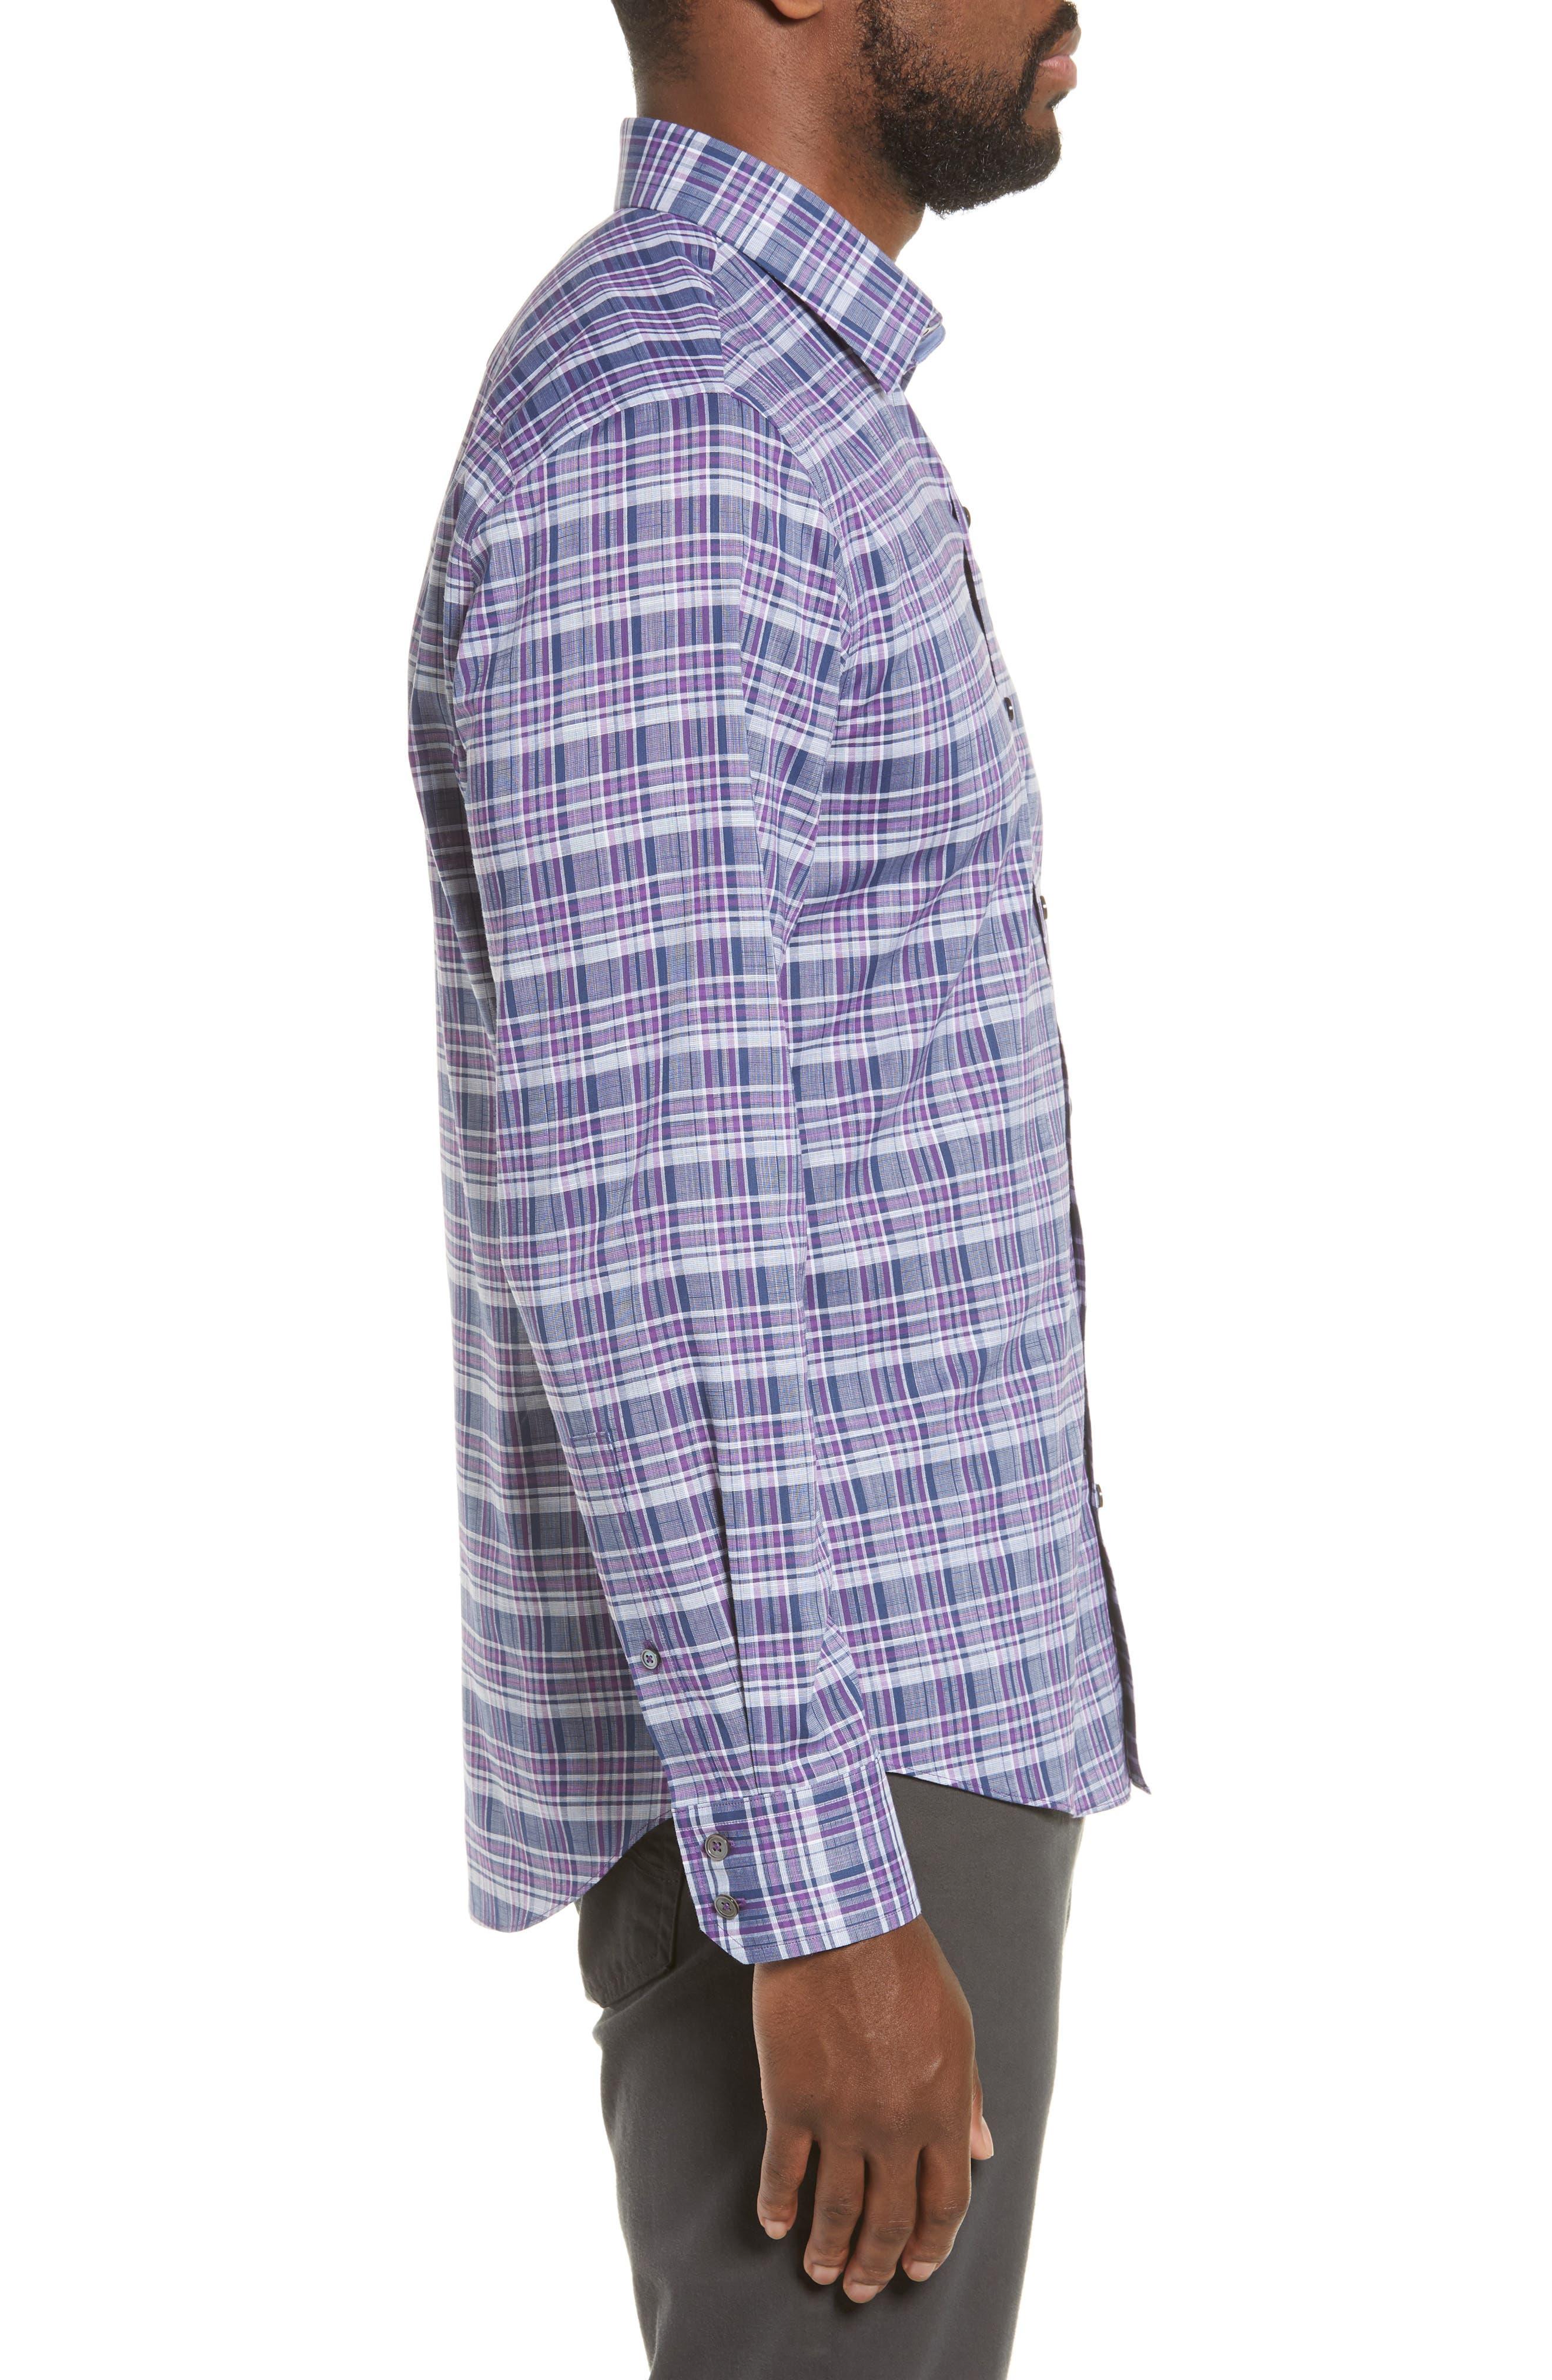 ZACHARY PRELL, Caro Regular Fit Sport Shirt, Alternate thumbnail 4, color, PURPLE